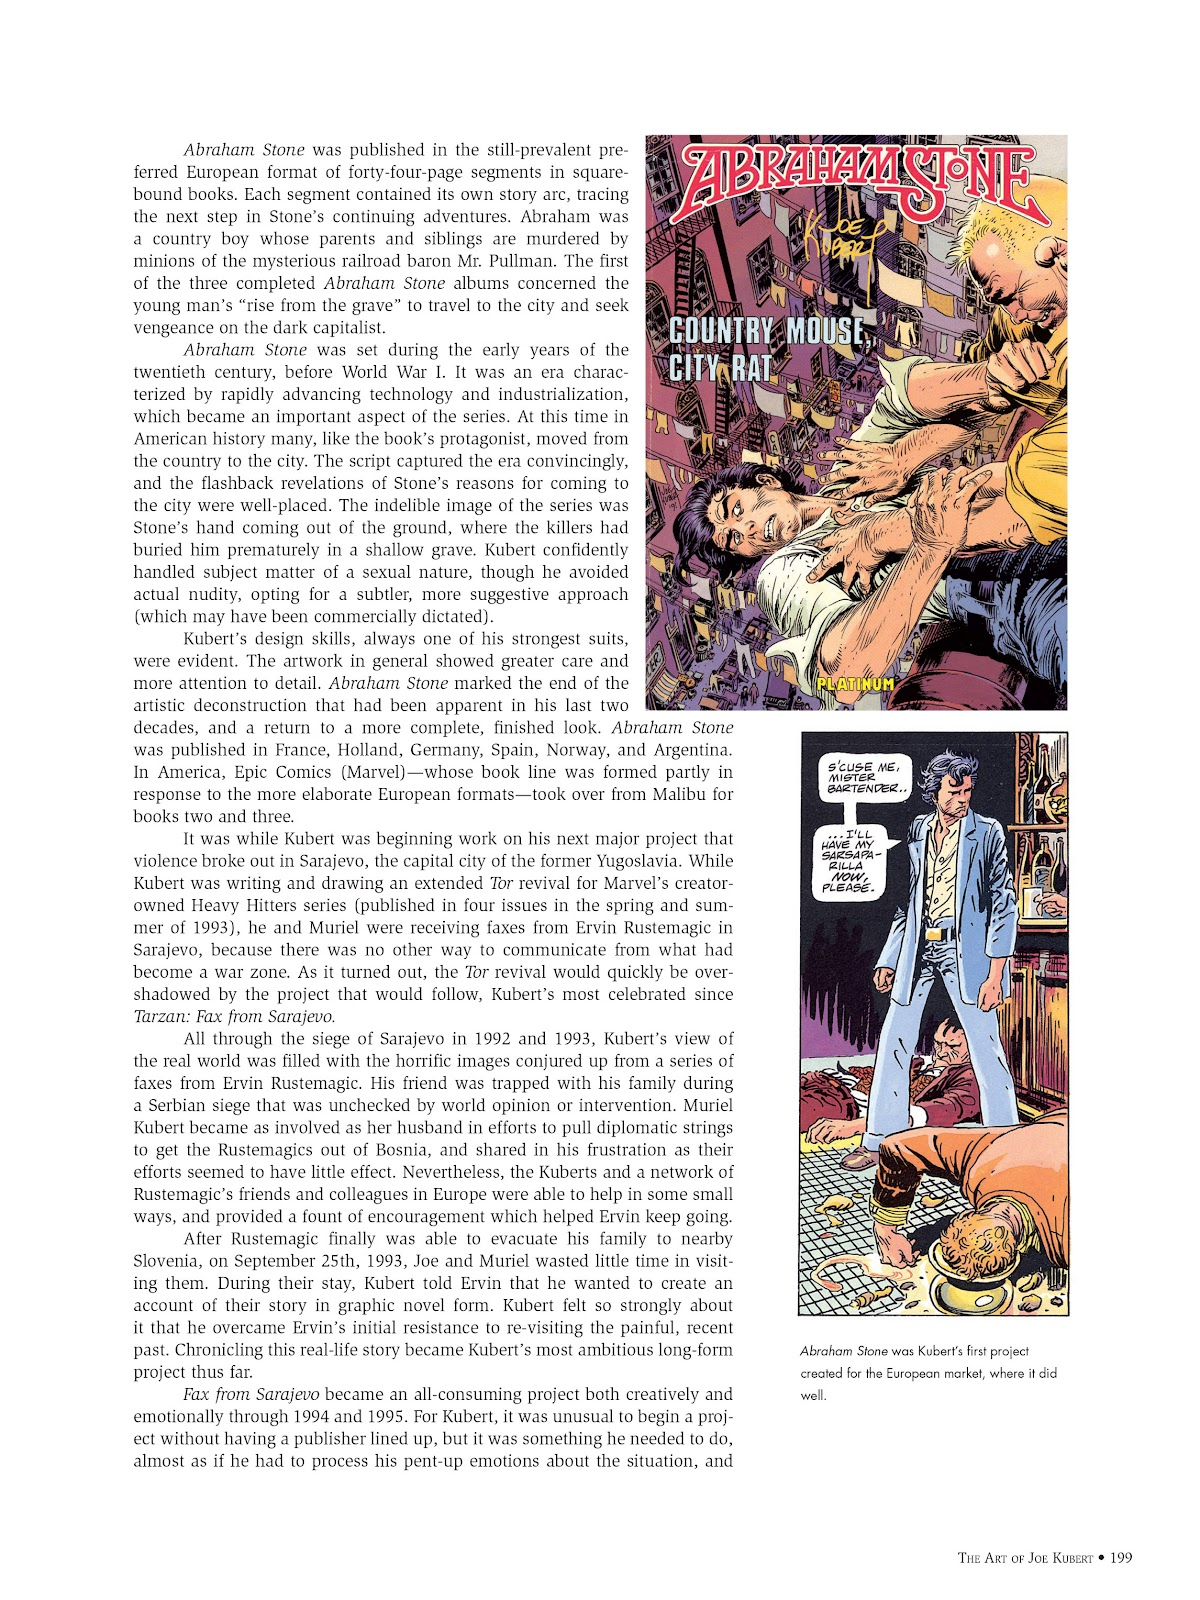 Read online The Art of Joe Kubert comic -  Issue # TPB (Part 2) - 99